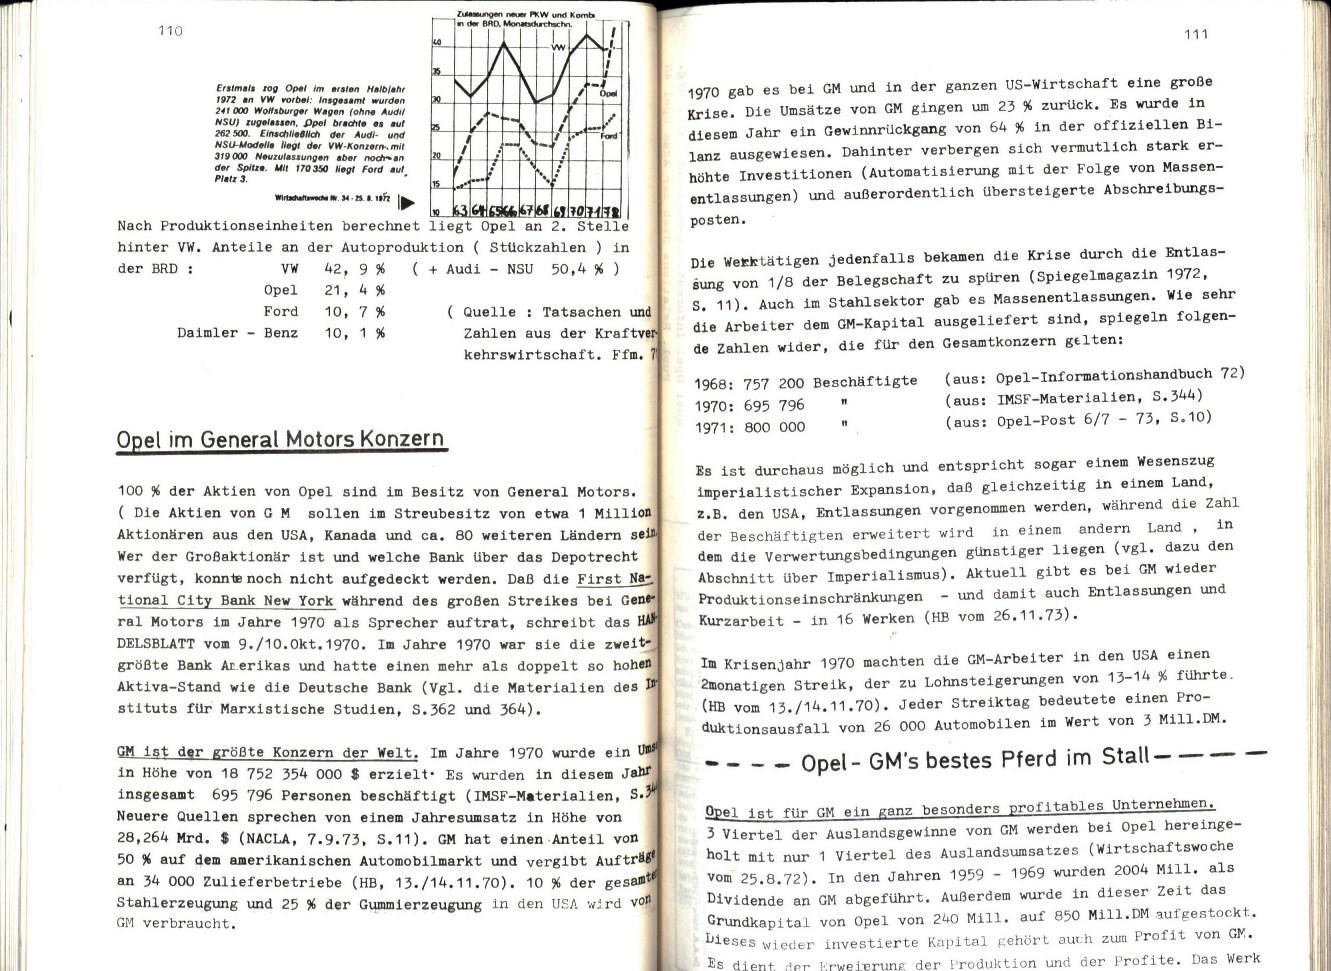 Bochum_IGM_Opel_PG_Opel_streikt_1973_057